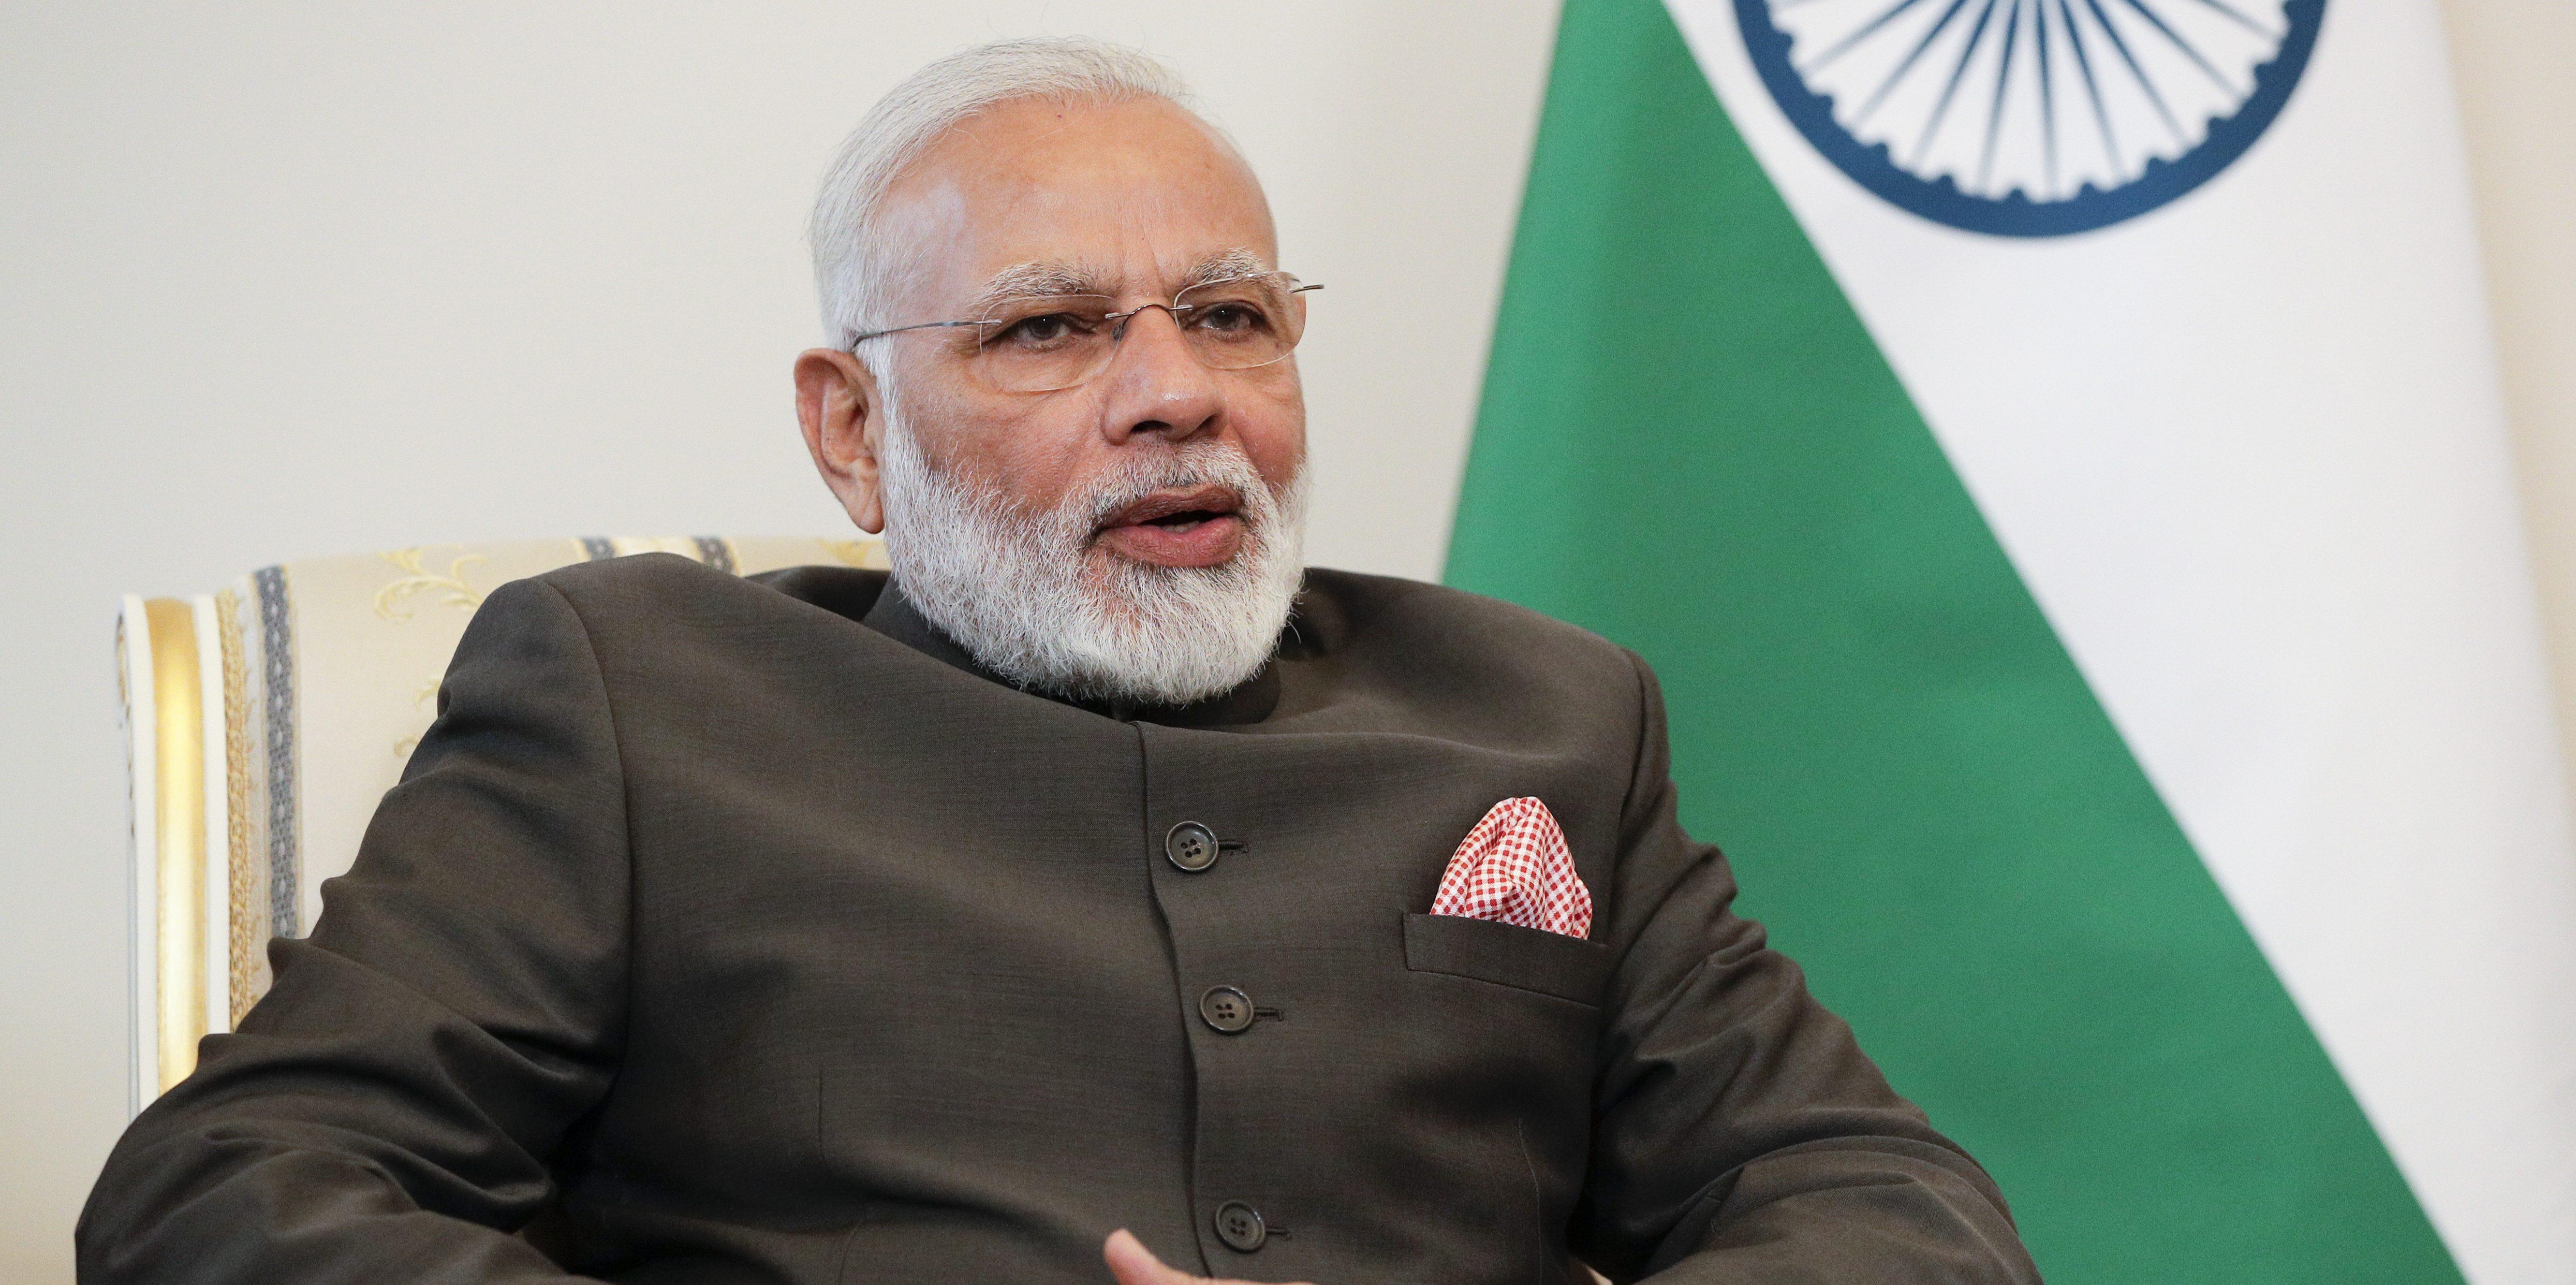 Indian Prime Minister Narendra Modi meets with Russian President Vladimir Putin on the sidelines of the St. Petersburg International Economic Forum (SPIEF), Russia, June 1, 2017. REUTERS/Dmitri Lovetsky/Pool - RTX38IZU